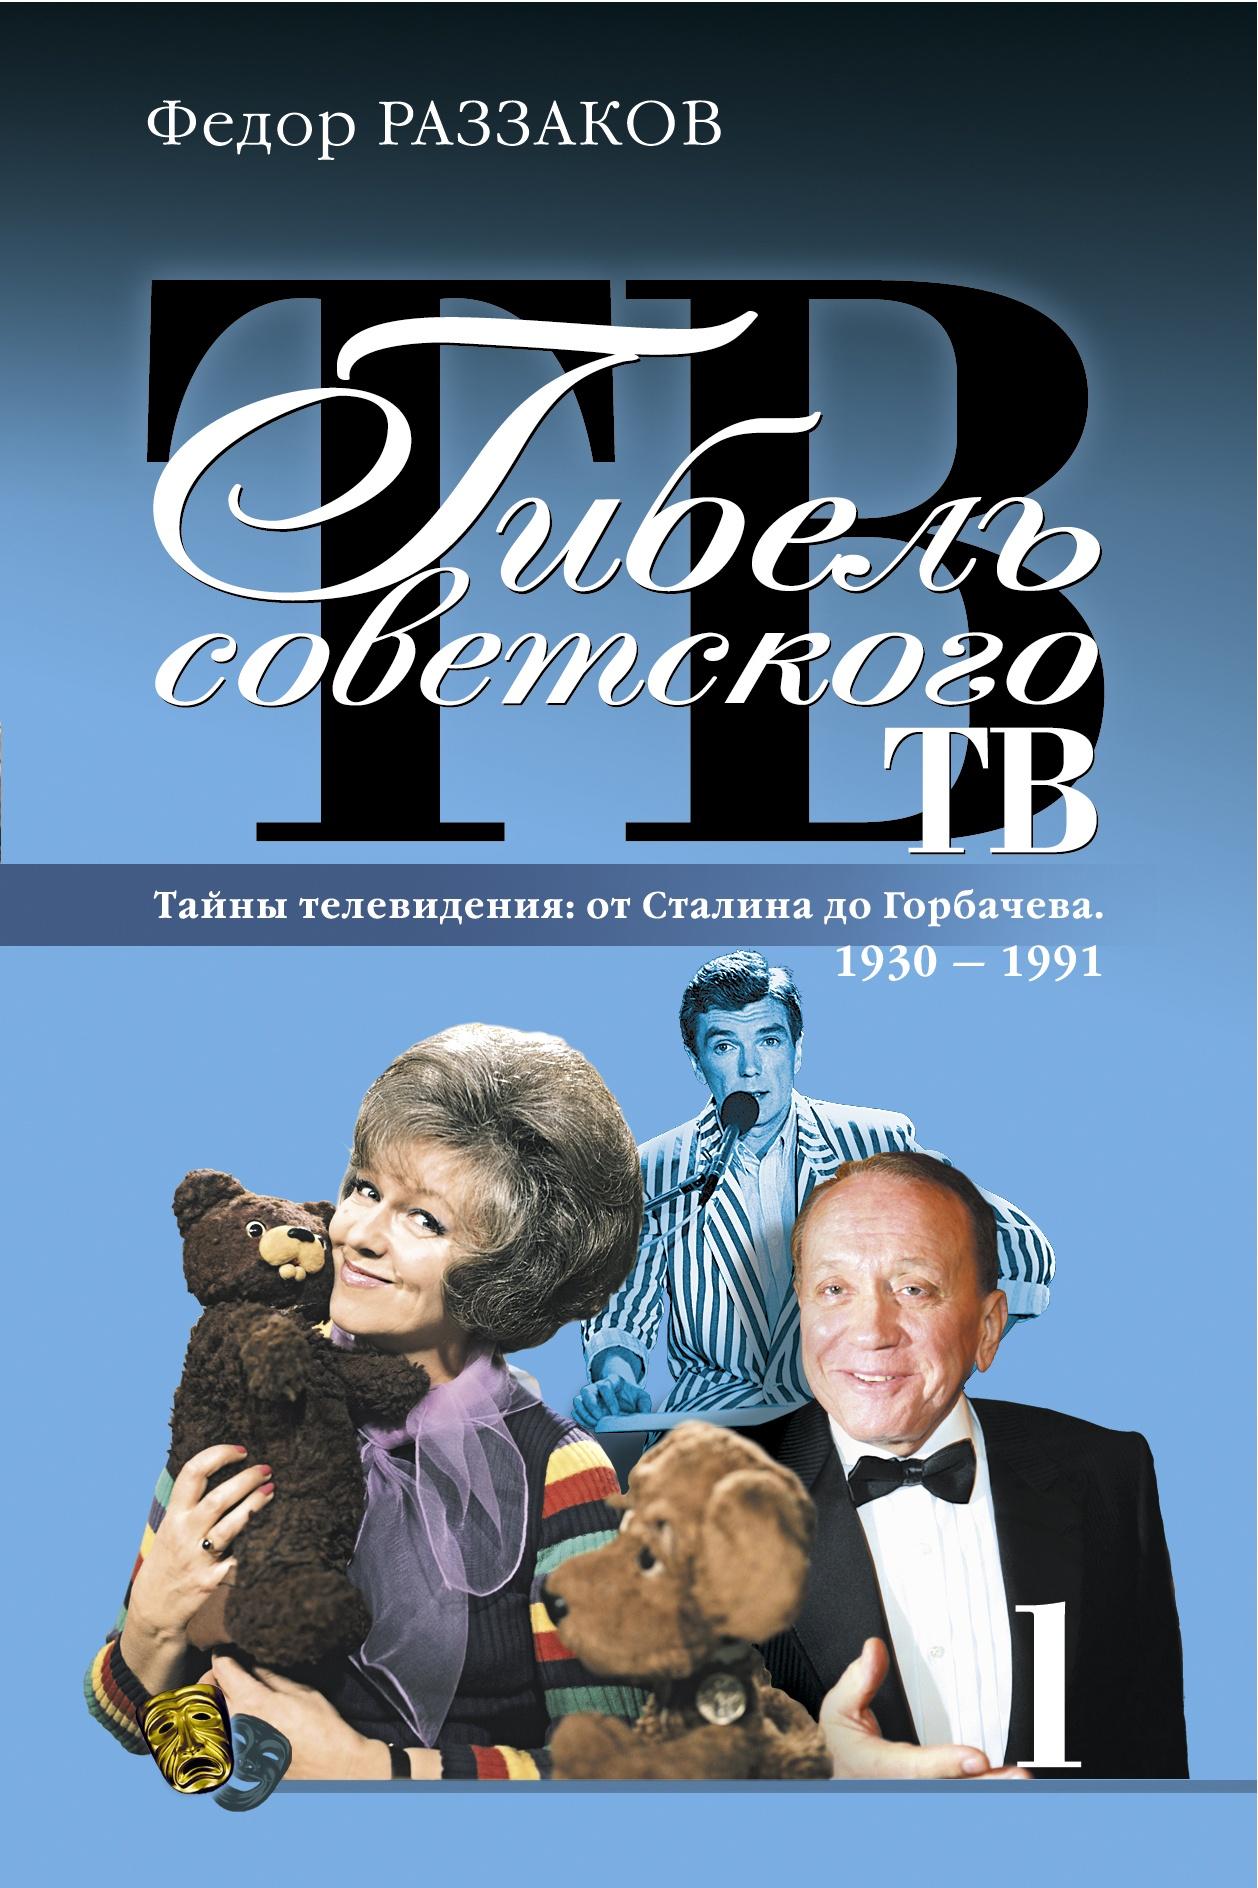 Гибель советского ТВ